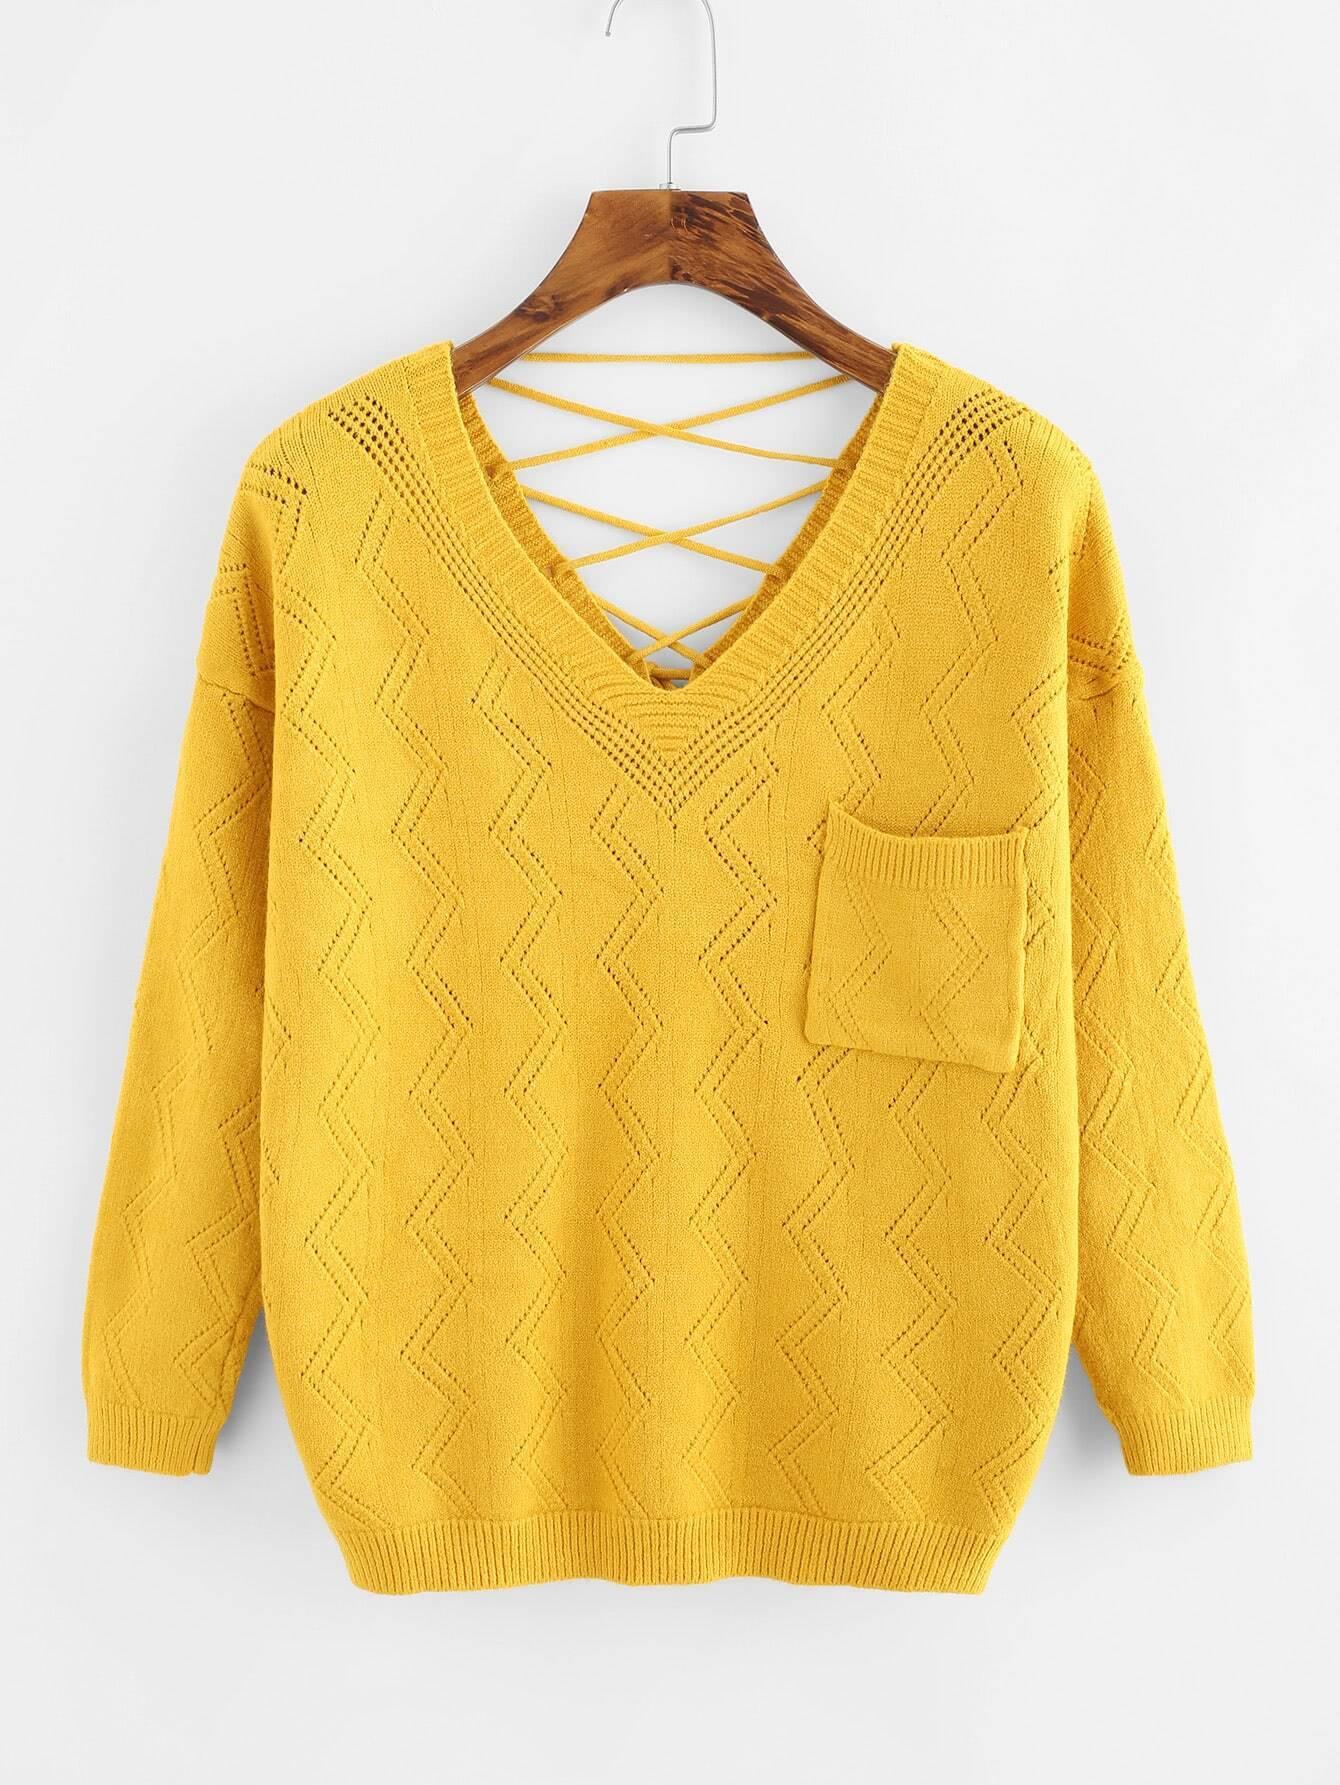 V Neckline Lace Up Chest Pocket Sweater